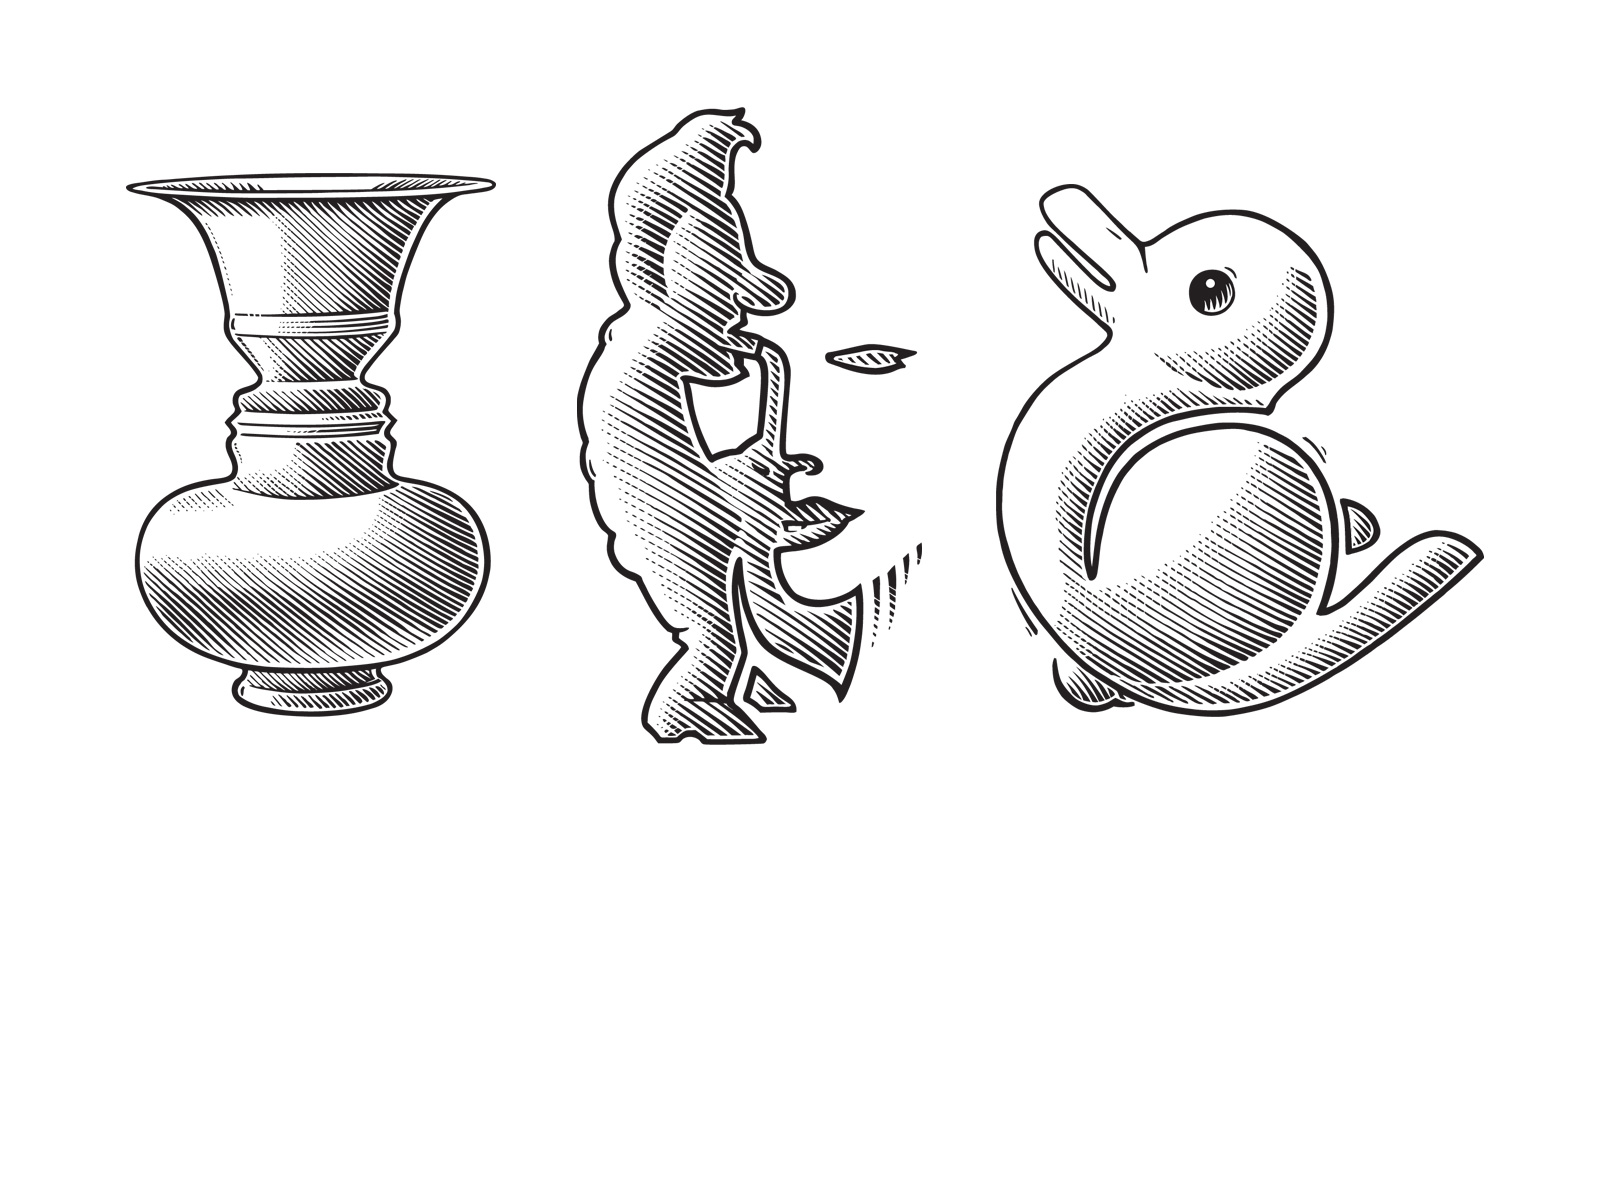 FREDERIK-Illustrations-JEUX-2905